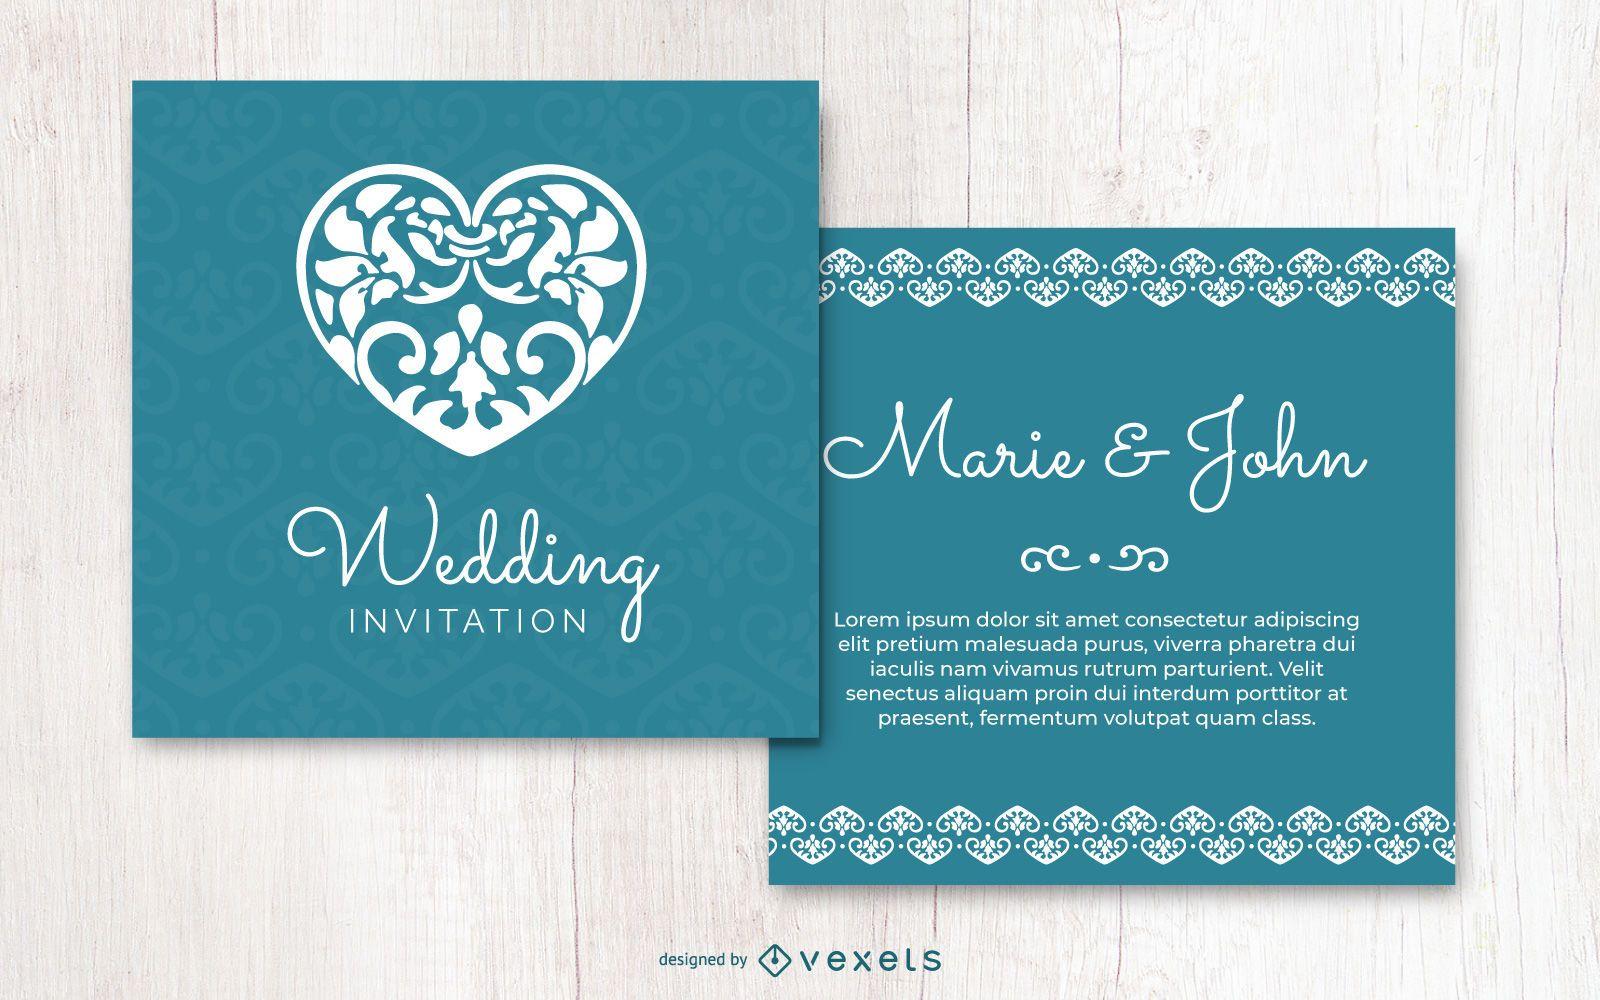 Invitación de boda de corazón floral creativo